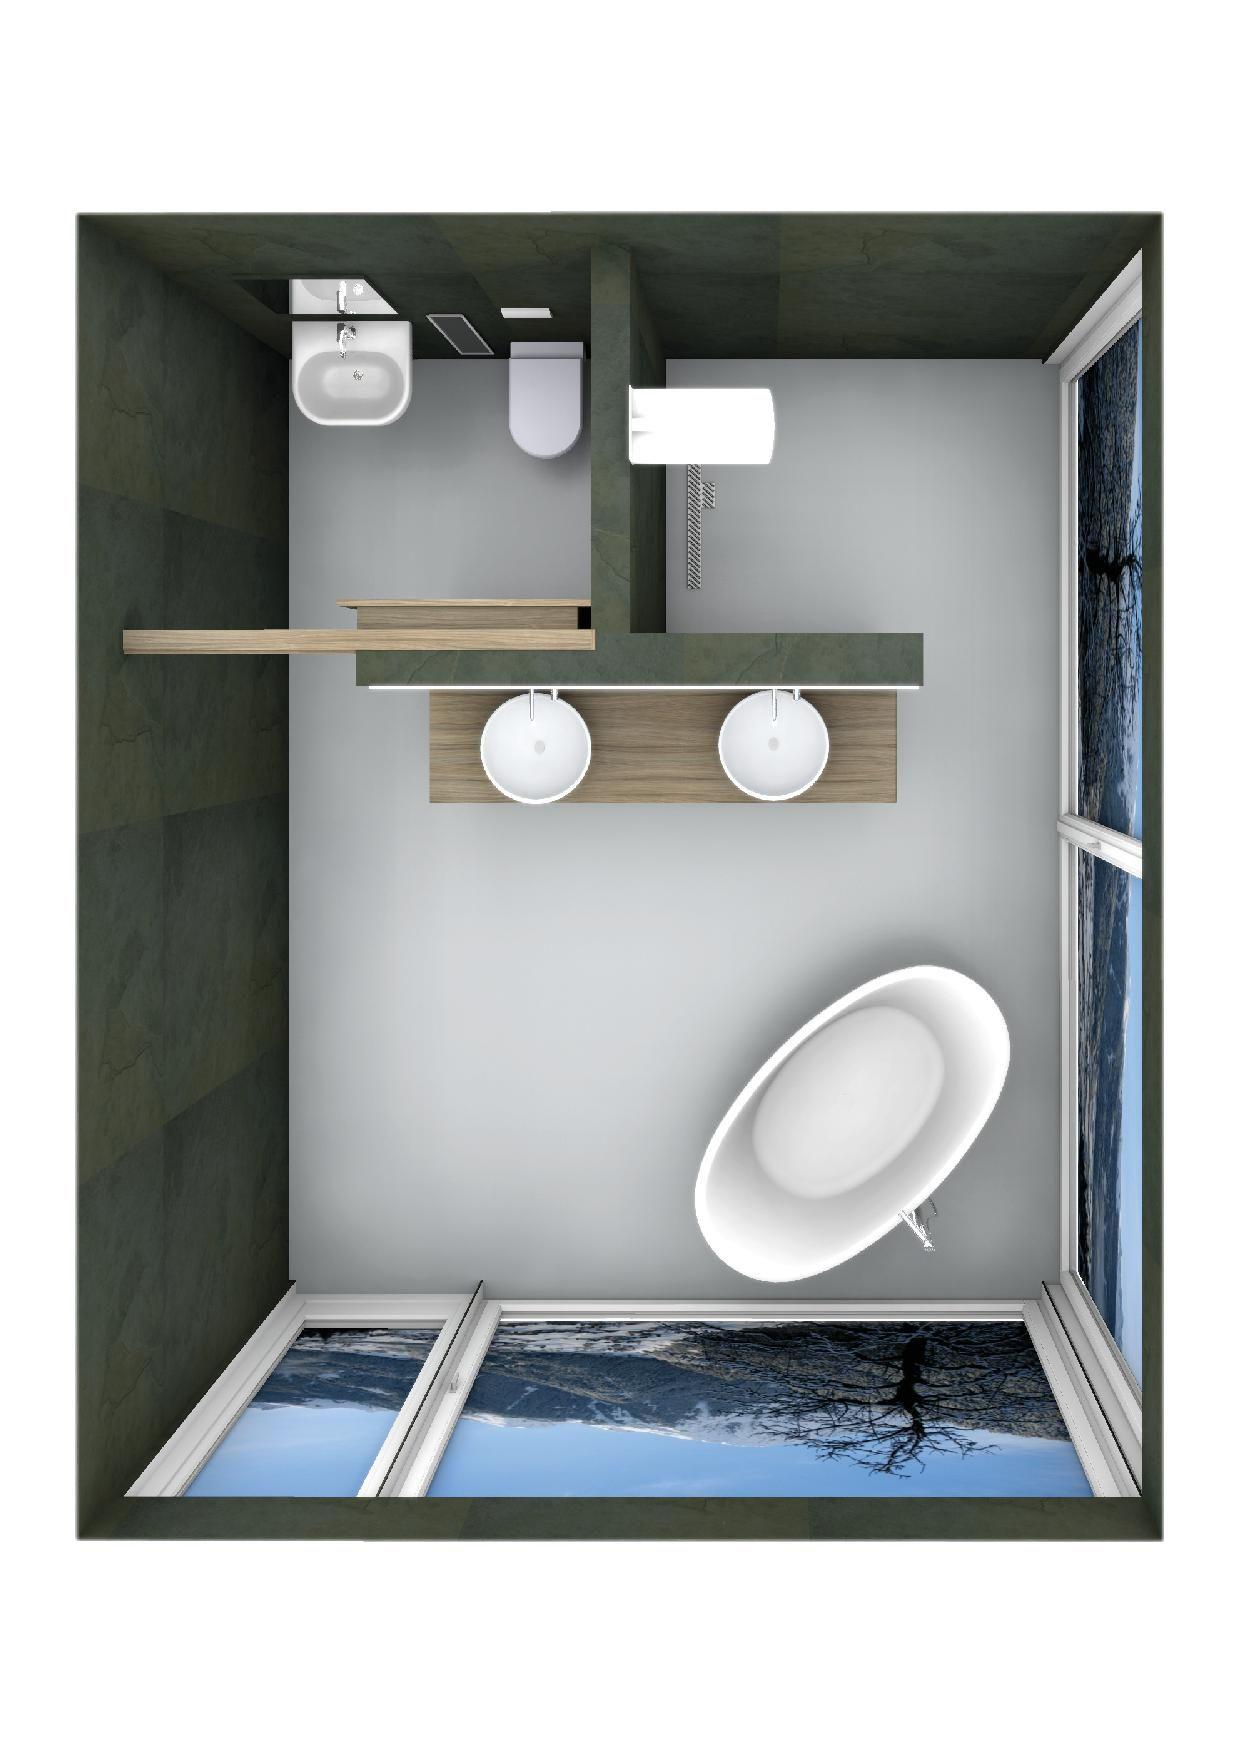 Schone Badplanung Mit Freistehender Badewanne Idee Salle De Bain Plan Salle De Bain Agencement Salle De Bain